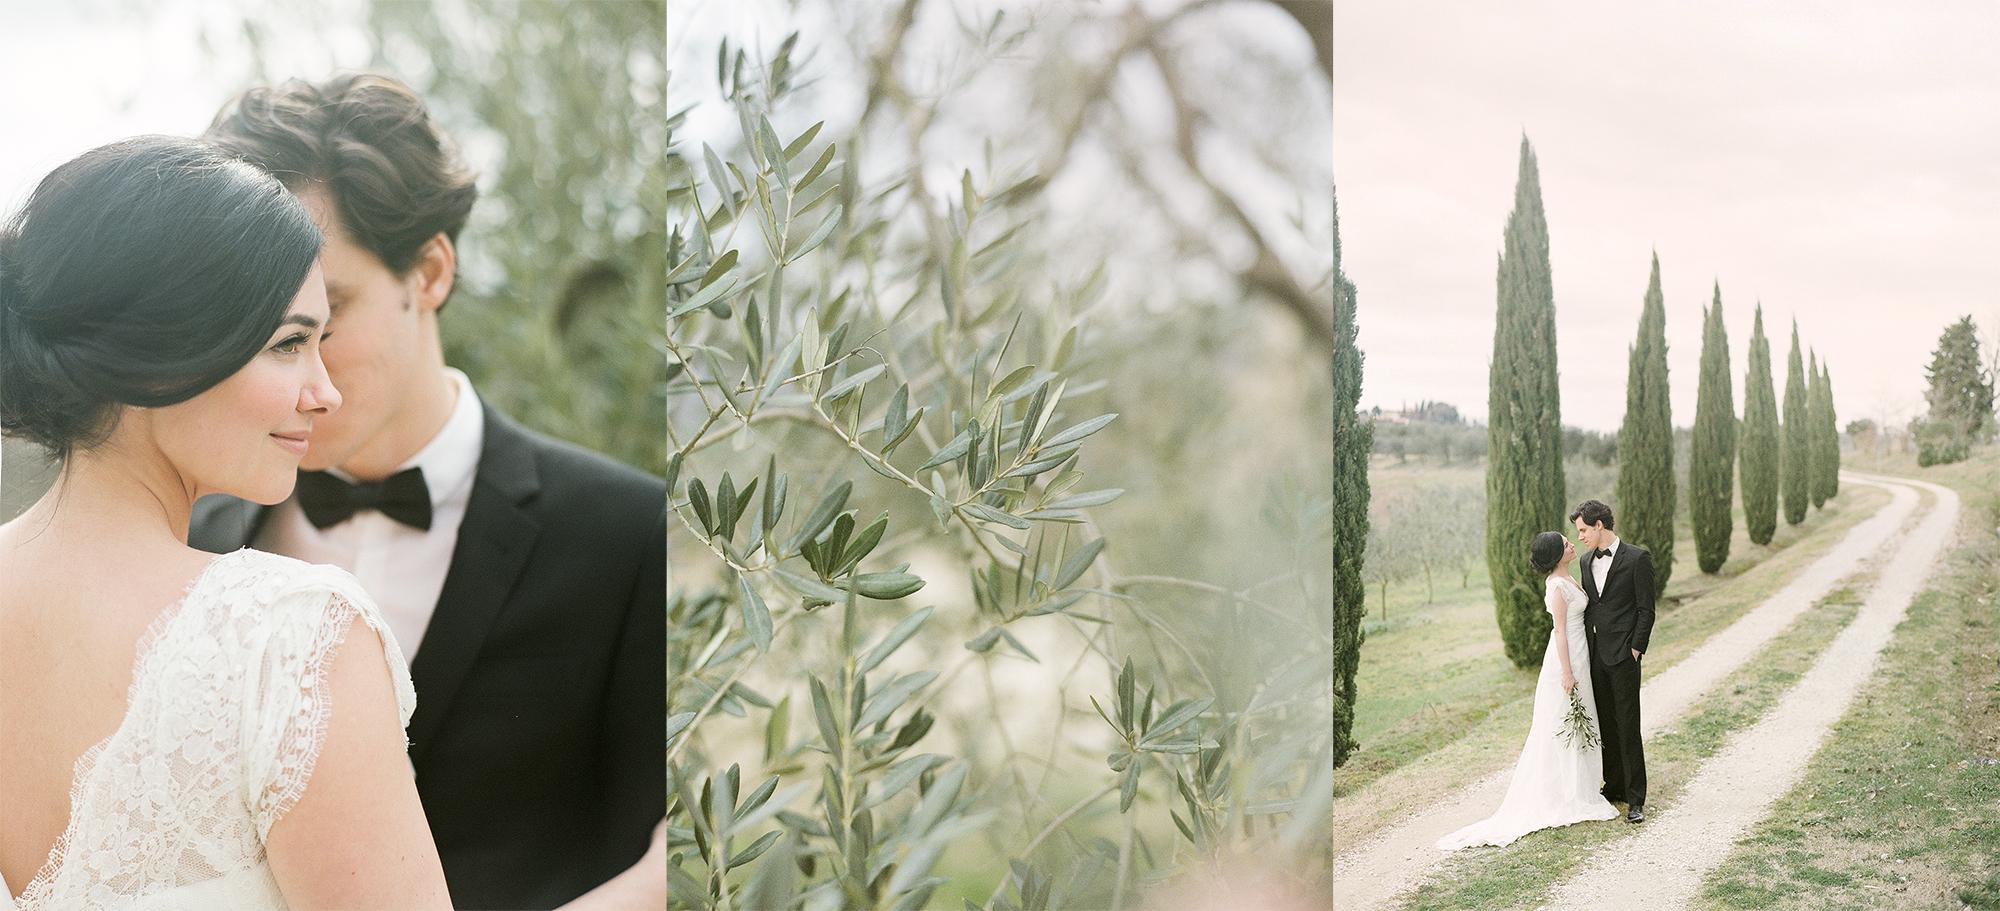 italy-wedding-photographer-bryce-sarah.jpg